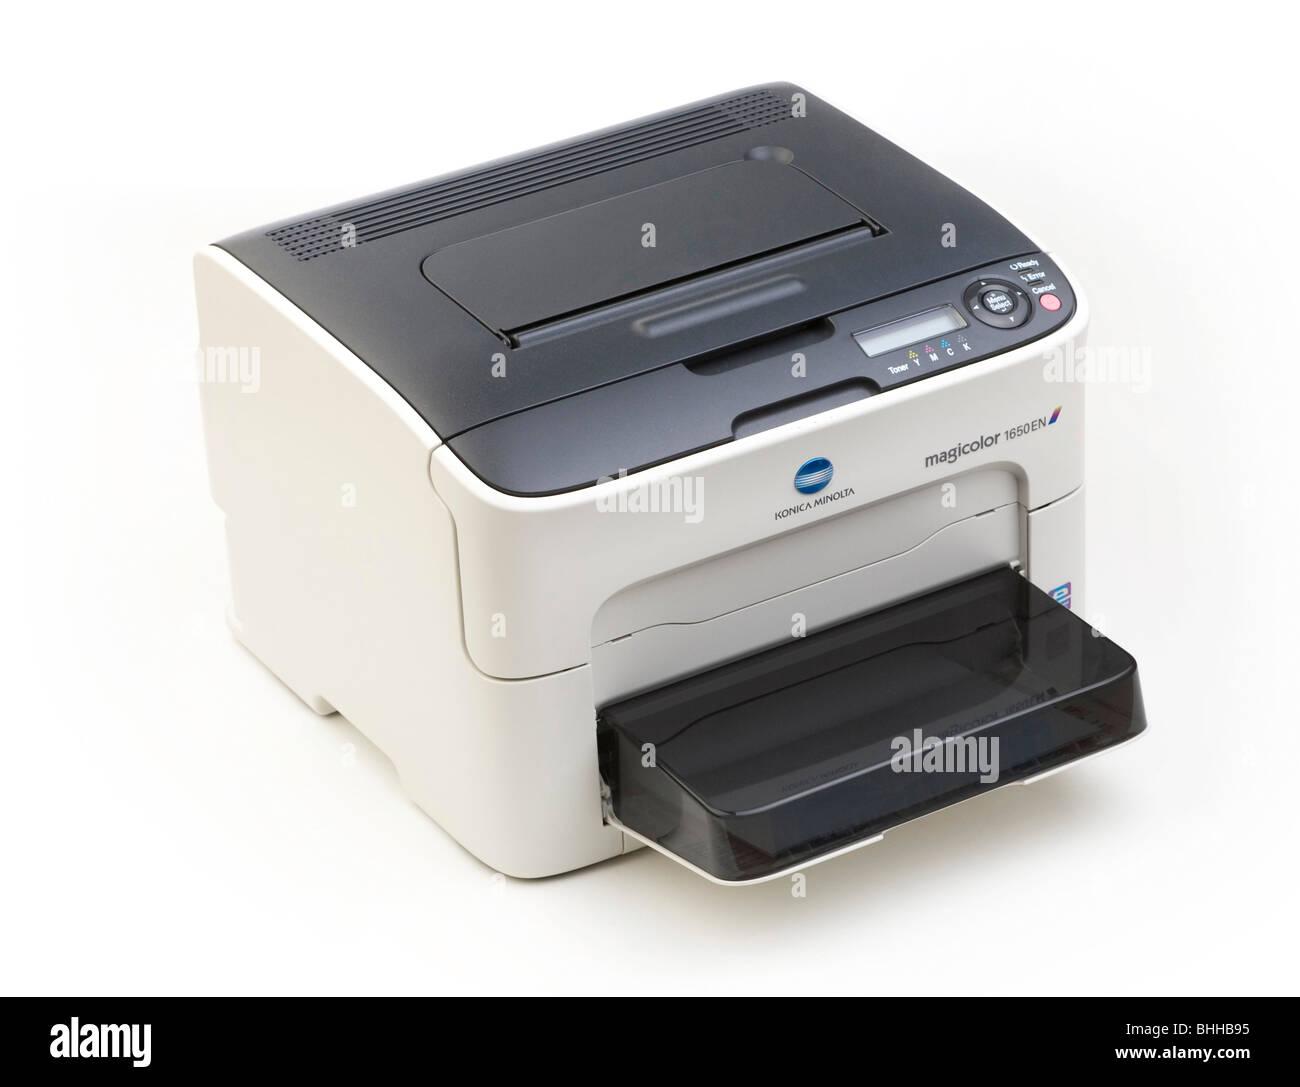 Konica Minolta Magicolor 1650EN colour laser printer - Stock Image